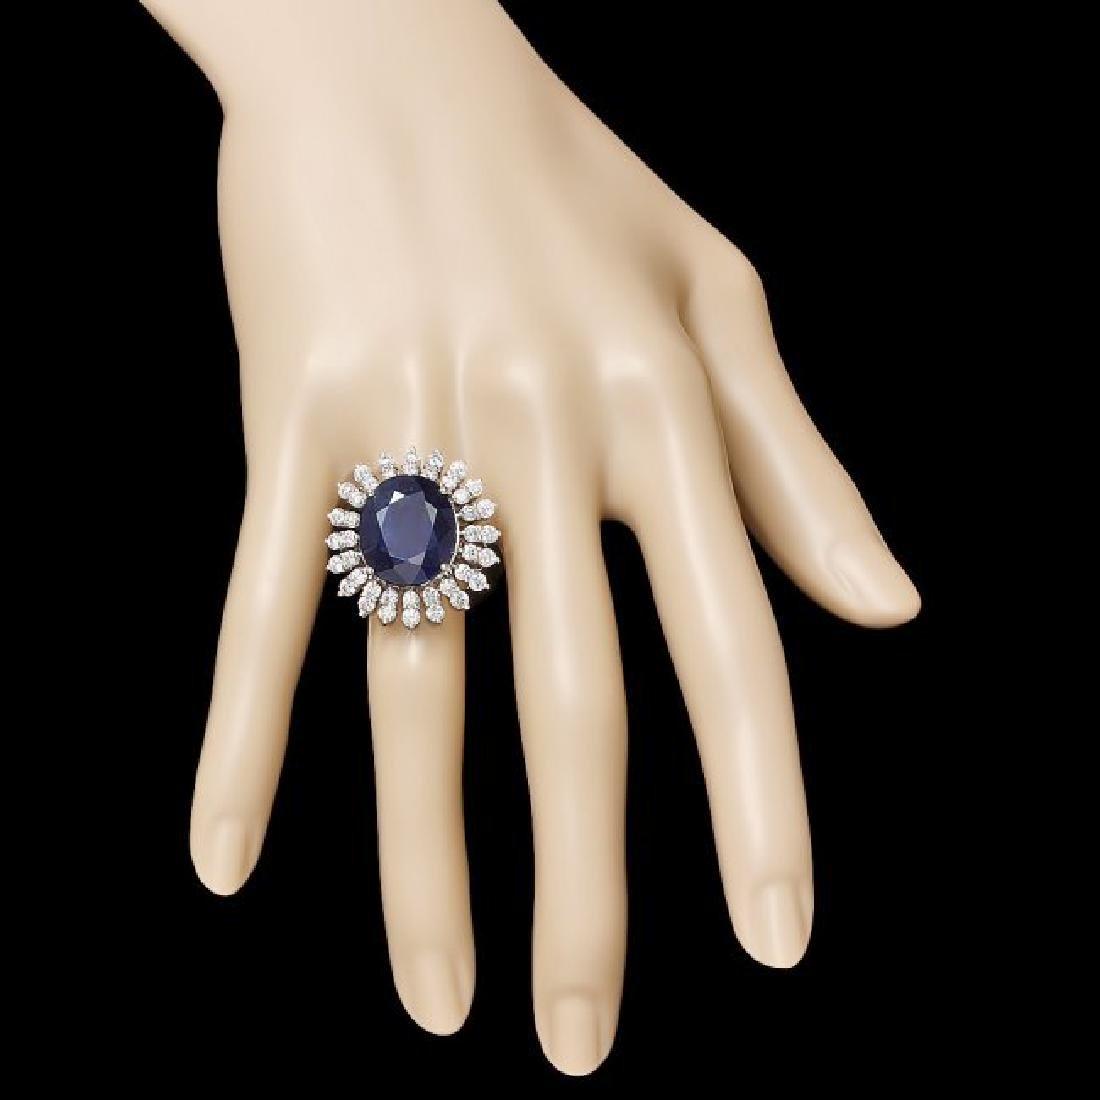 14k Gold 15.00ct Sapphire 2.45ct Diamond Ring - 3